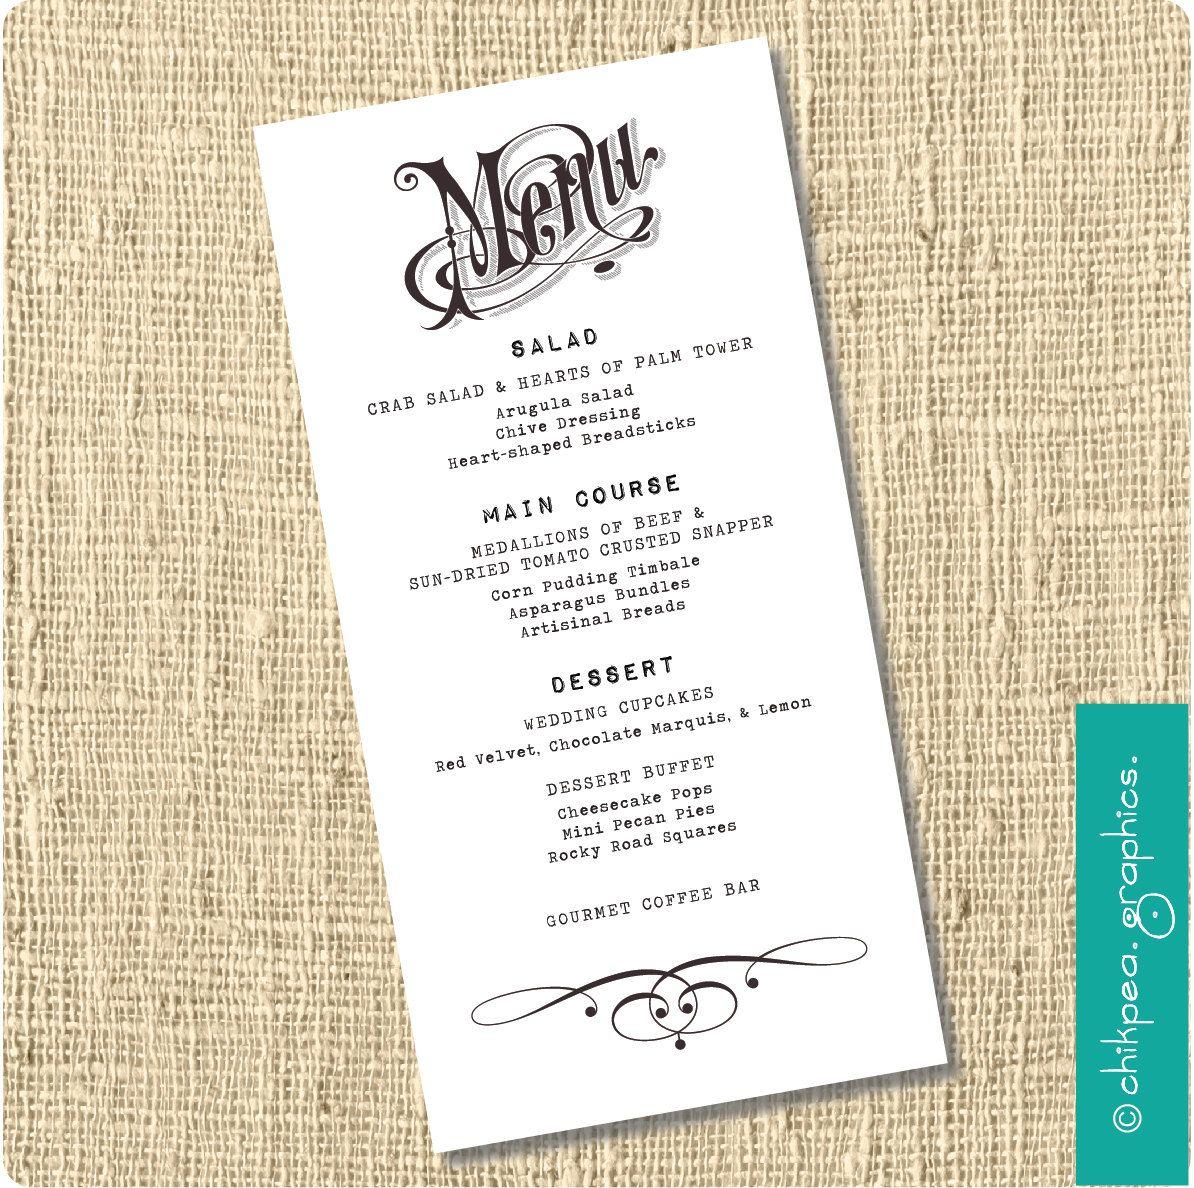 Black Tie Menu 33 75 Via Etsy Dinner Party Wedding Menu